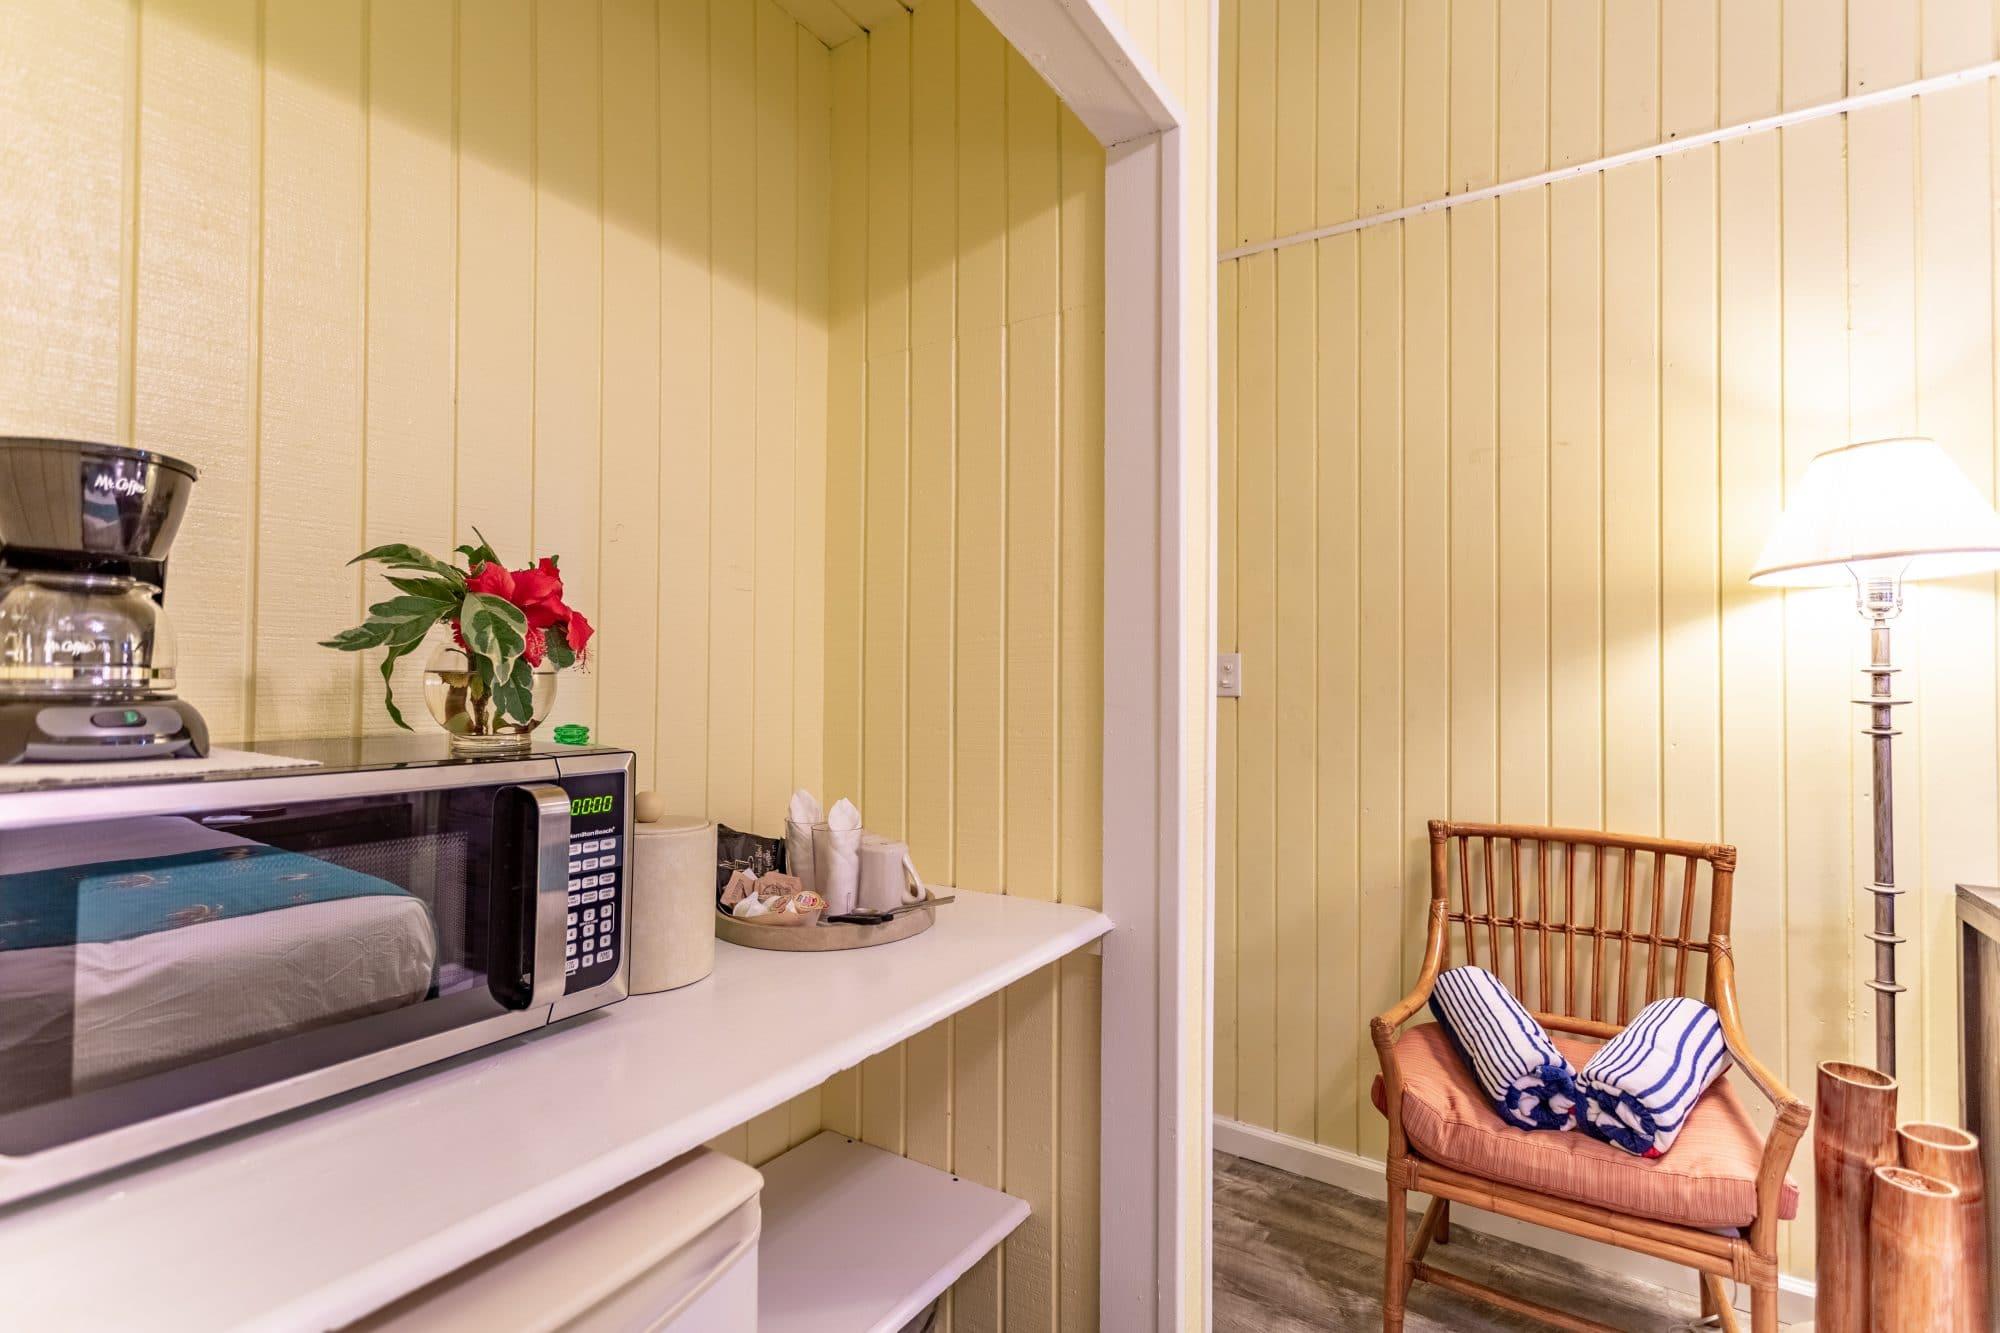 Sebastians_Room36-4